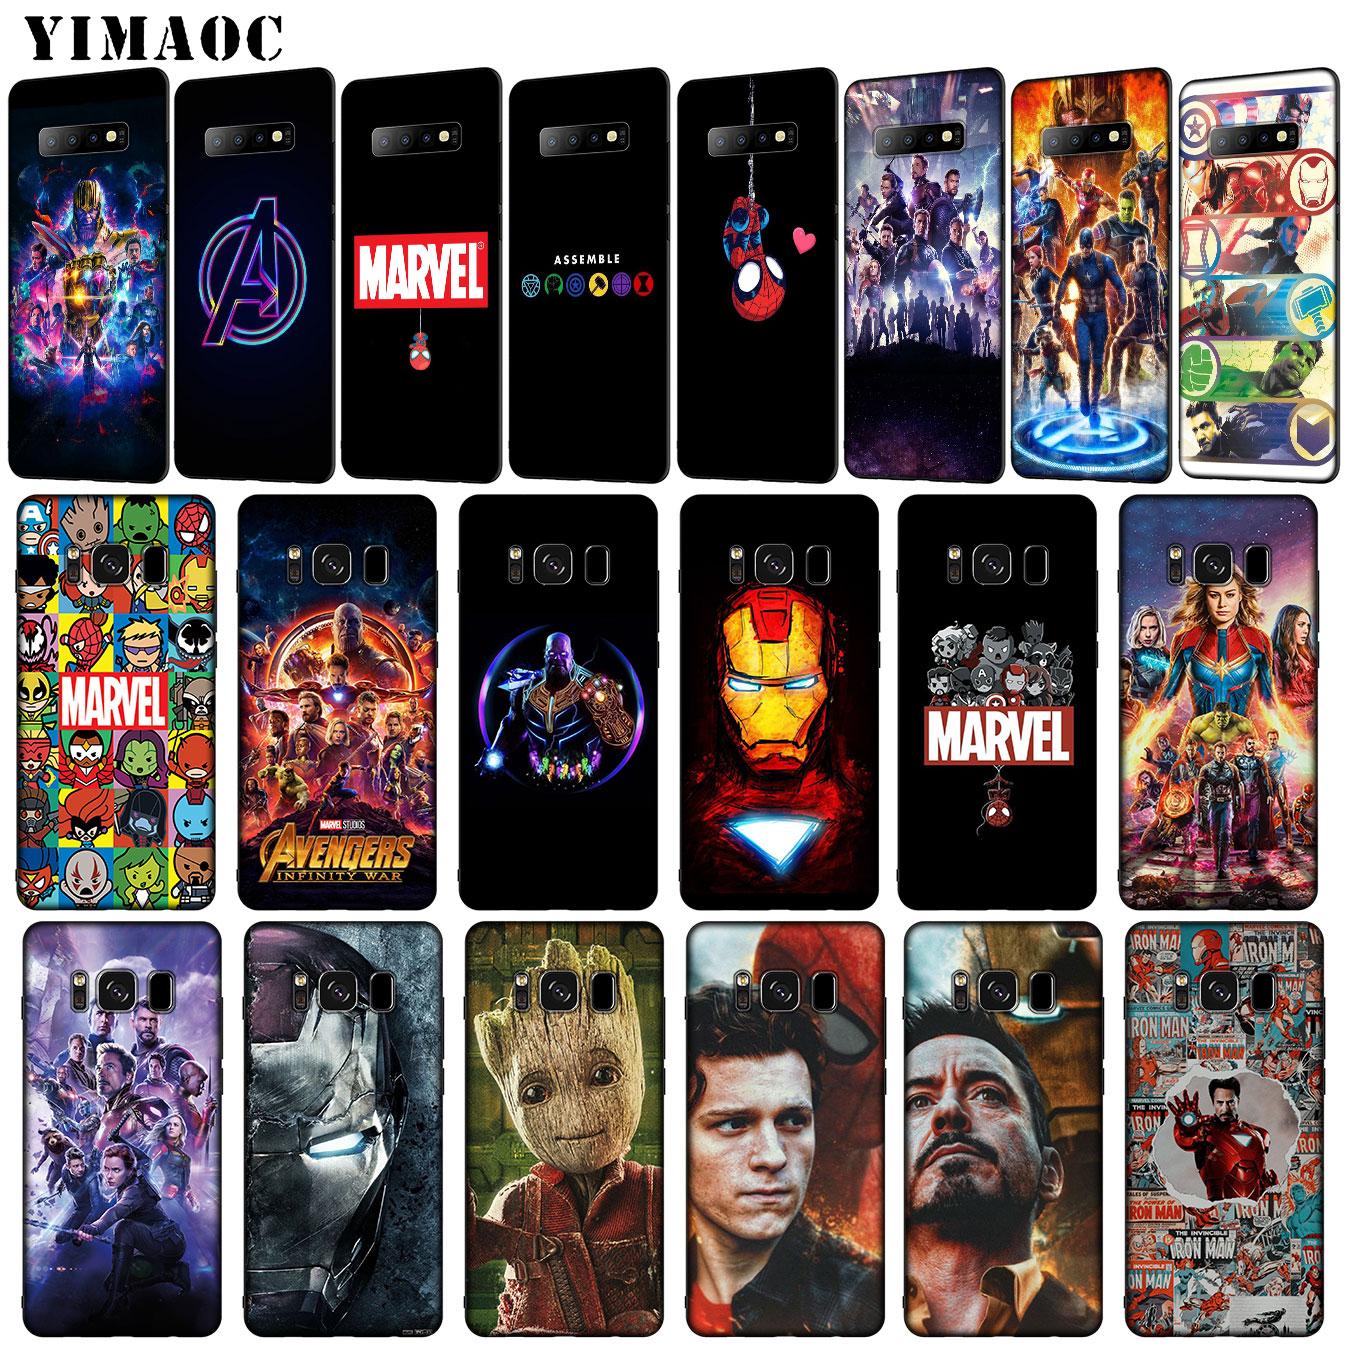 IYICAO Avengers Endgame Marvel Iron Man Thanos logo Soft Silicone Case for Samsung Galaxy S10 S9 S8 Plus S6 S7 Edge S10e E Cover action figure pokemon